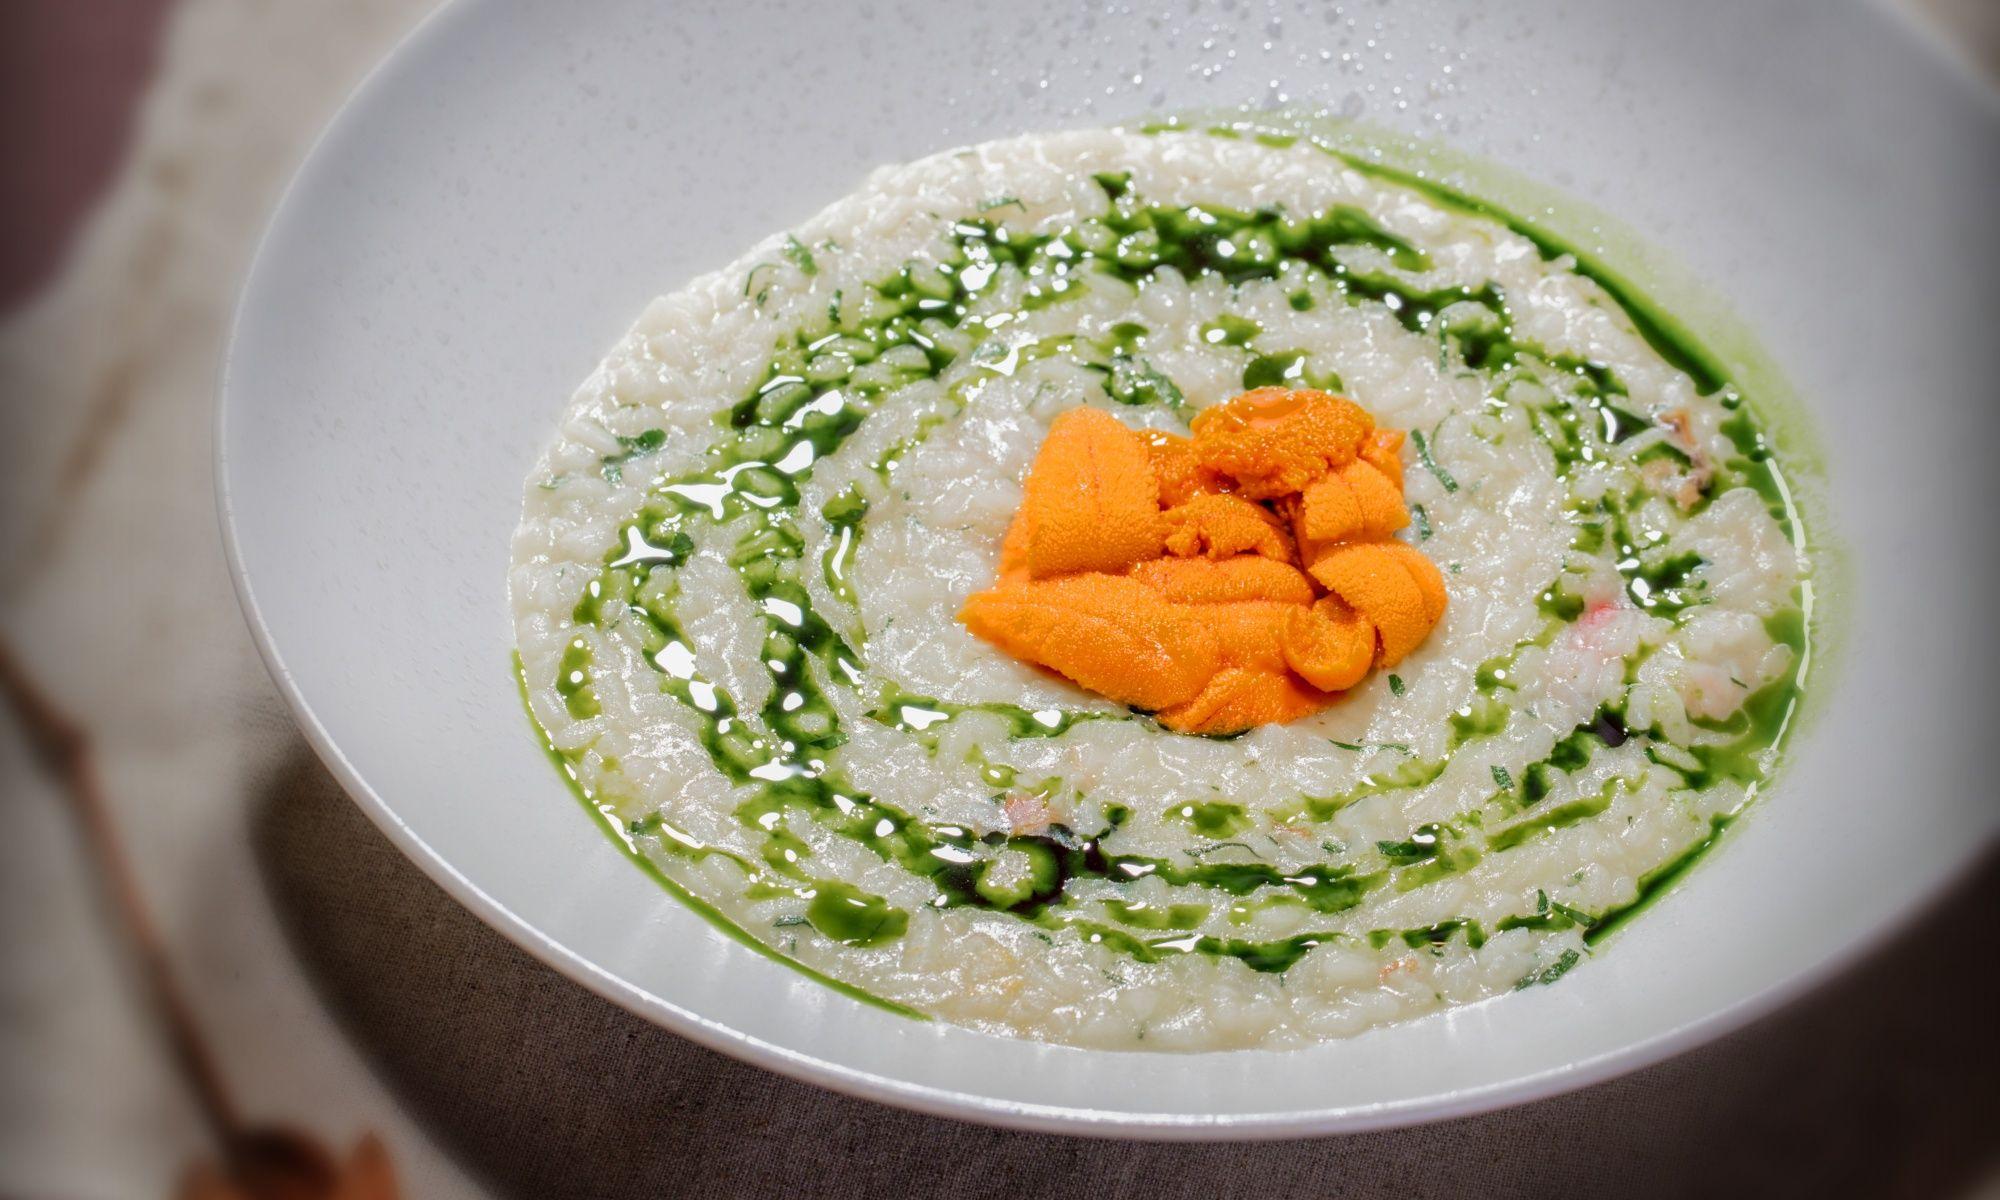 Restaurant Review: Modern European Amelia Needs Better Focus To Make It Big